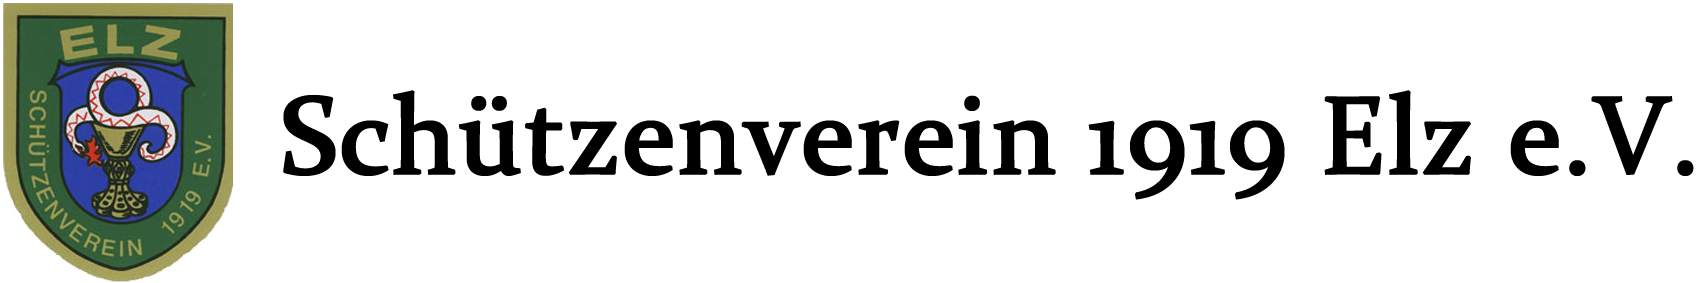 Schützenverein 1919 Elz e.V.